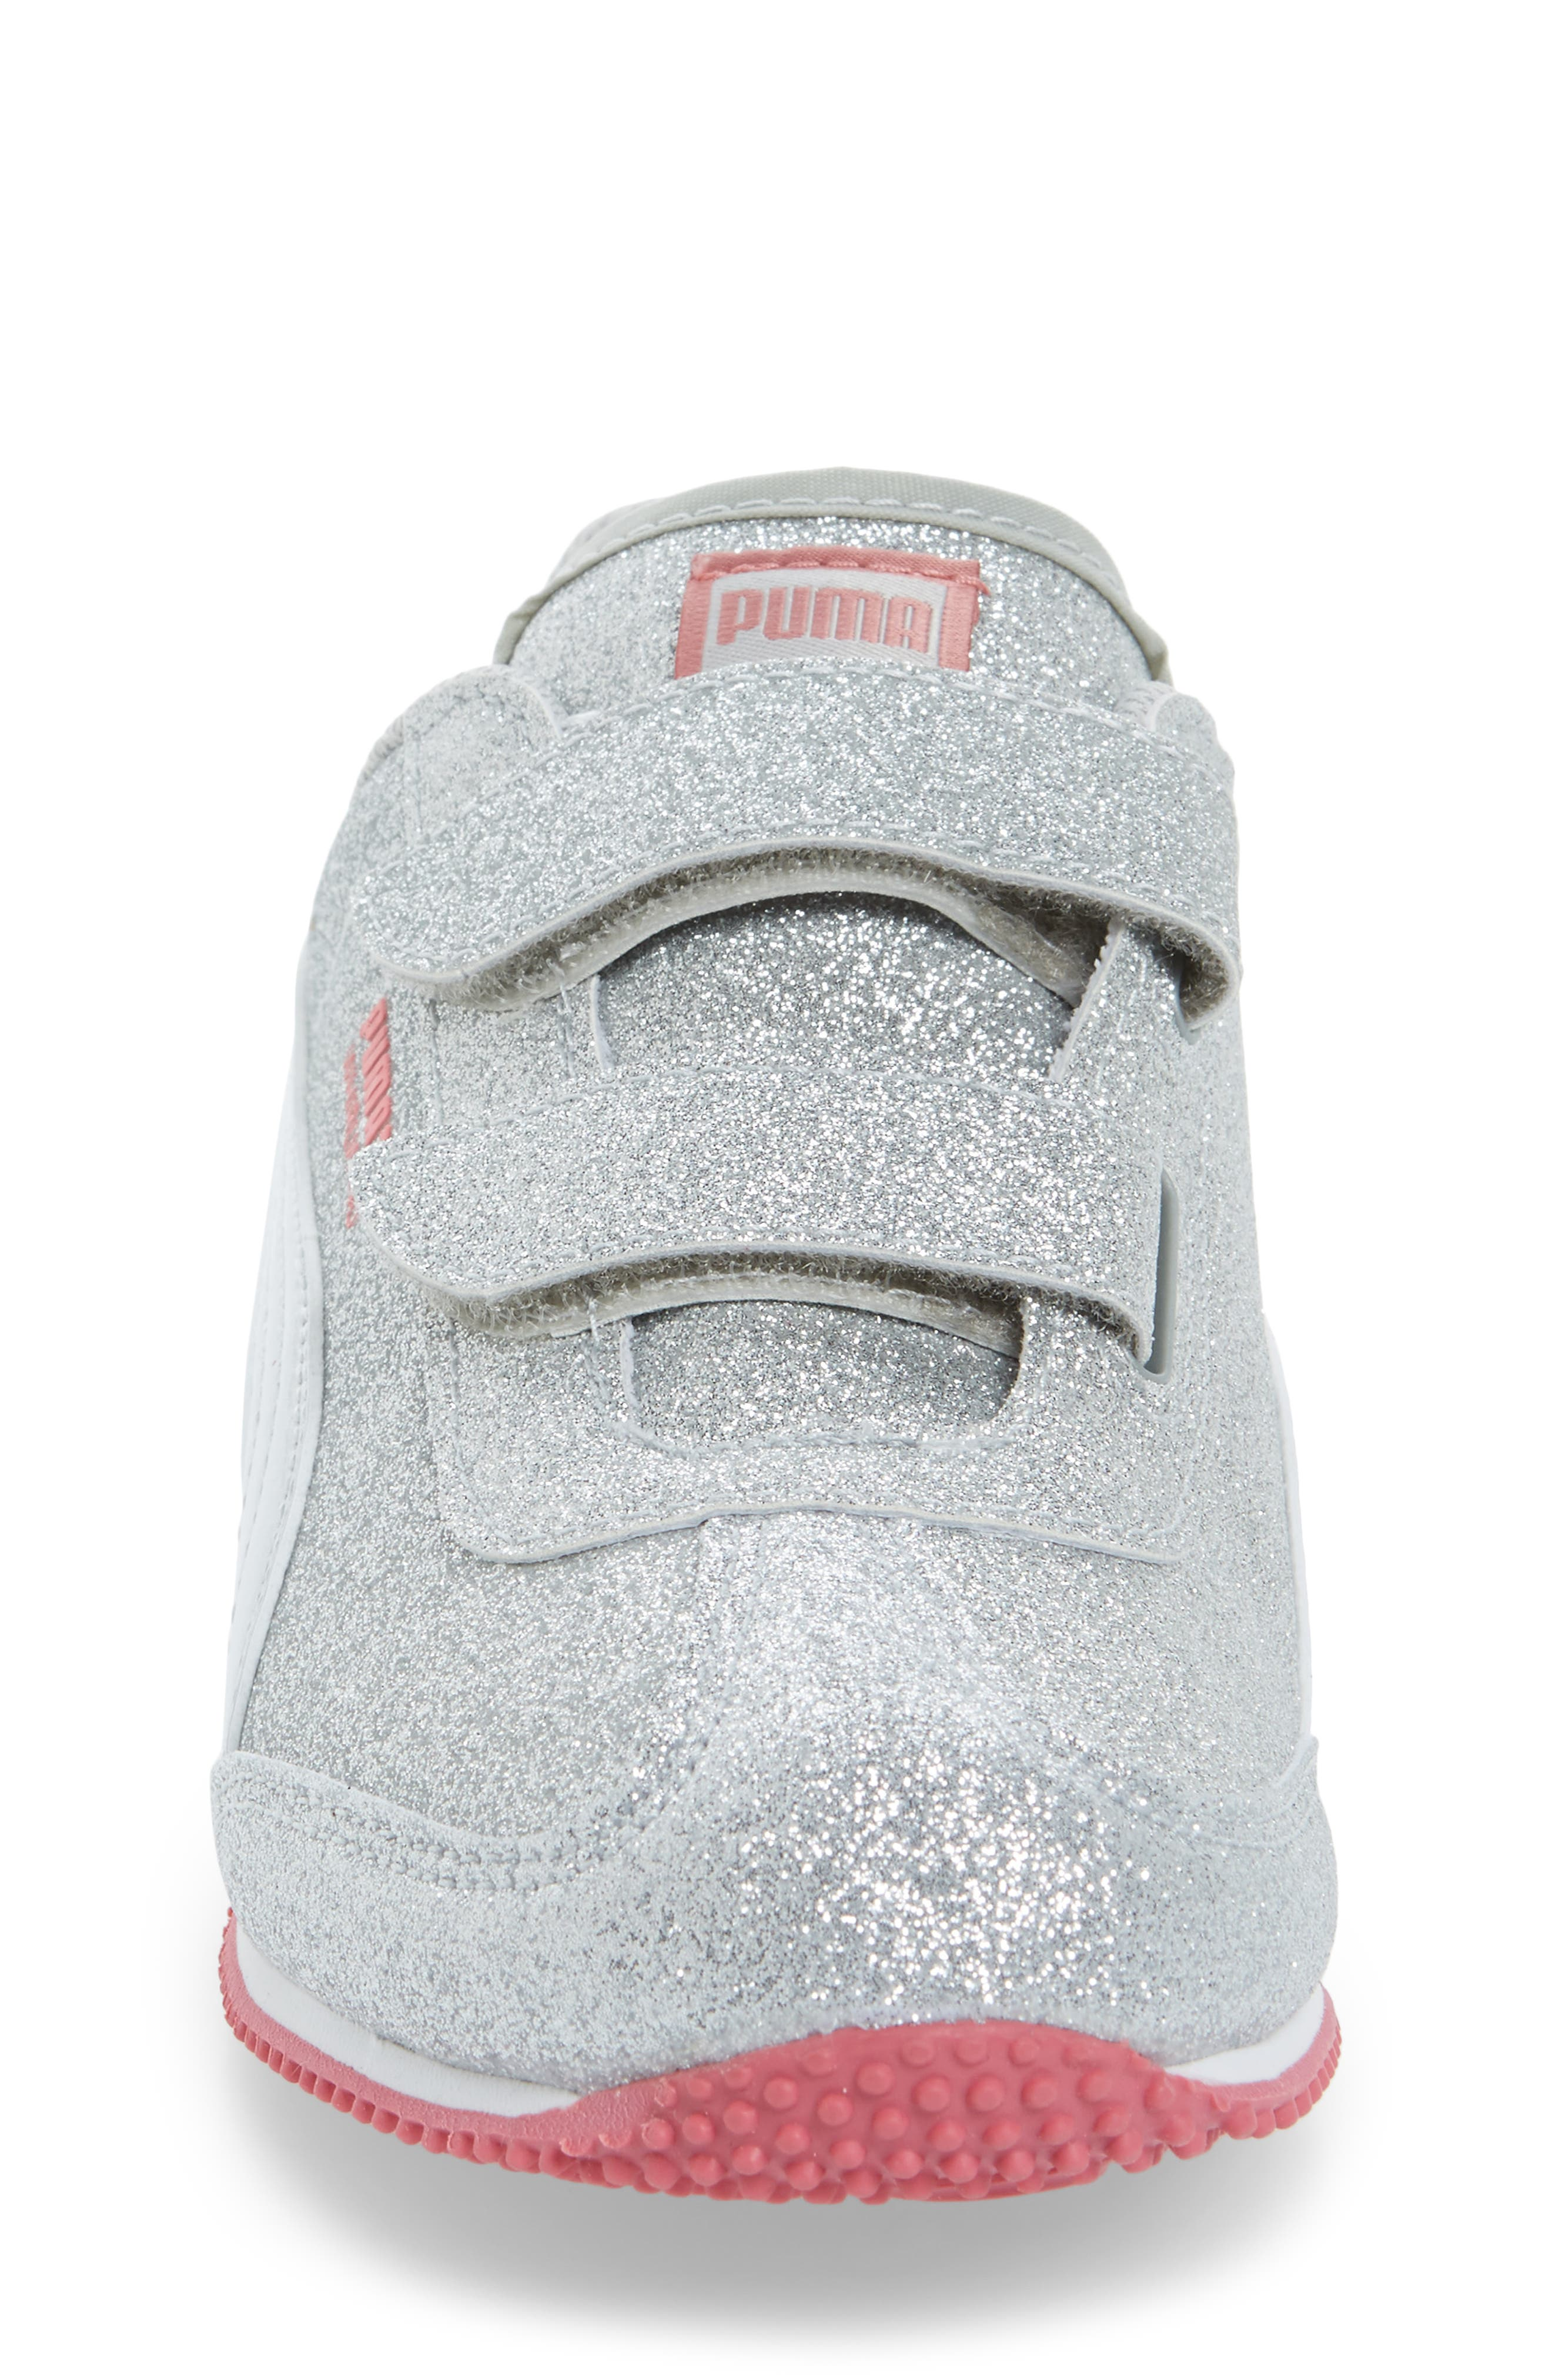 Whirlwind Glitz Sneaker,                             Alternate thumbnail 4, color,                             040